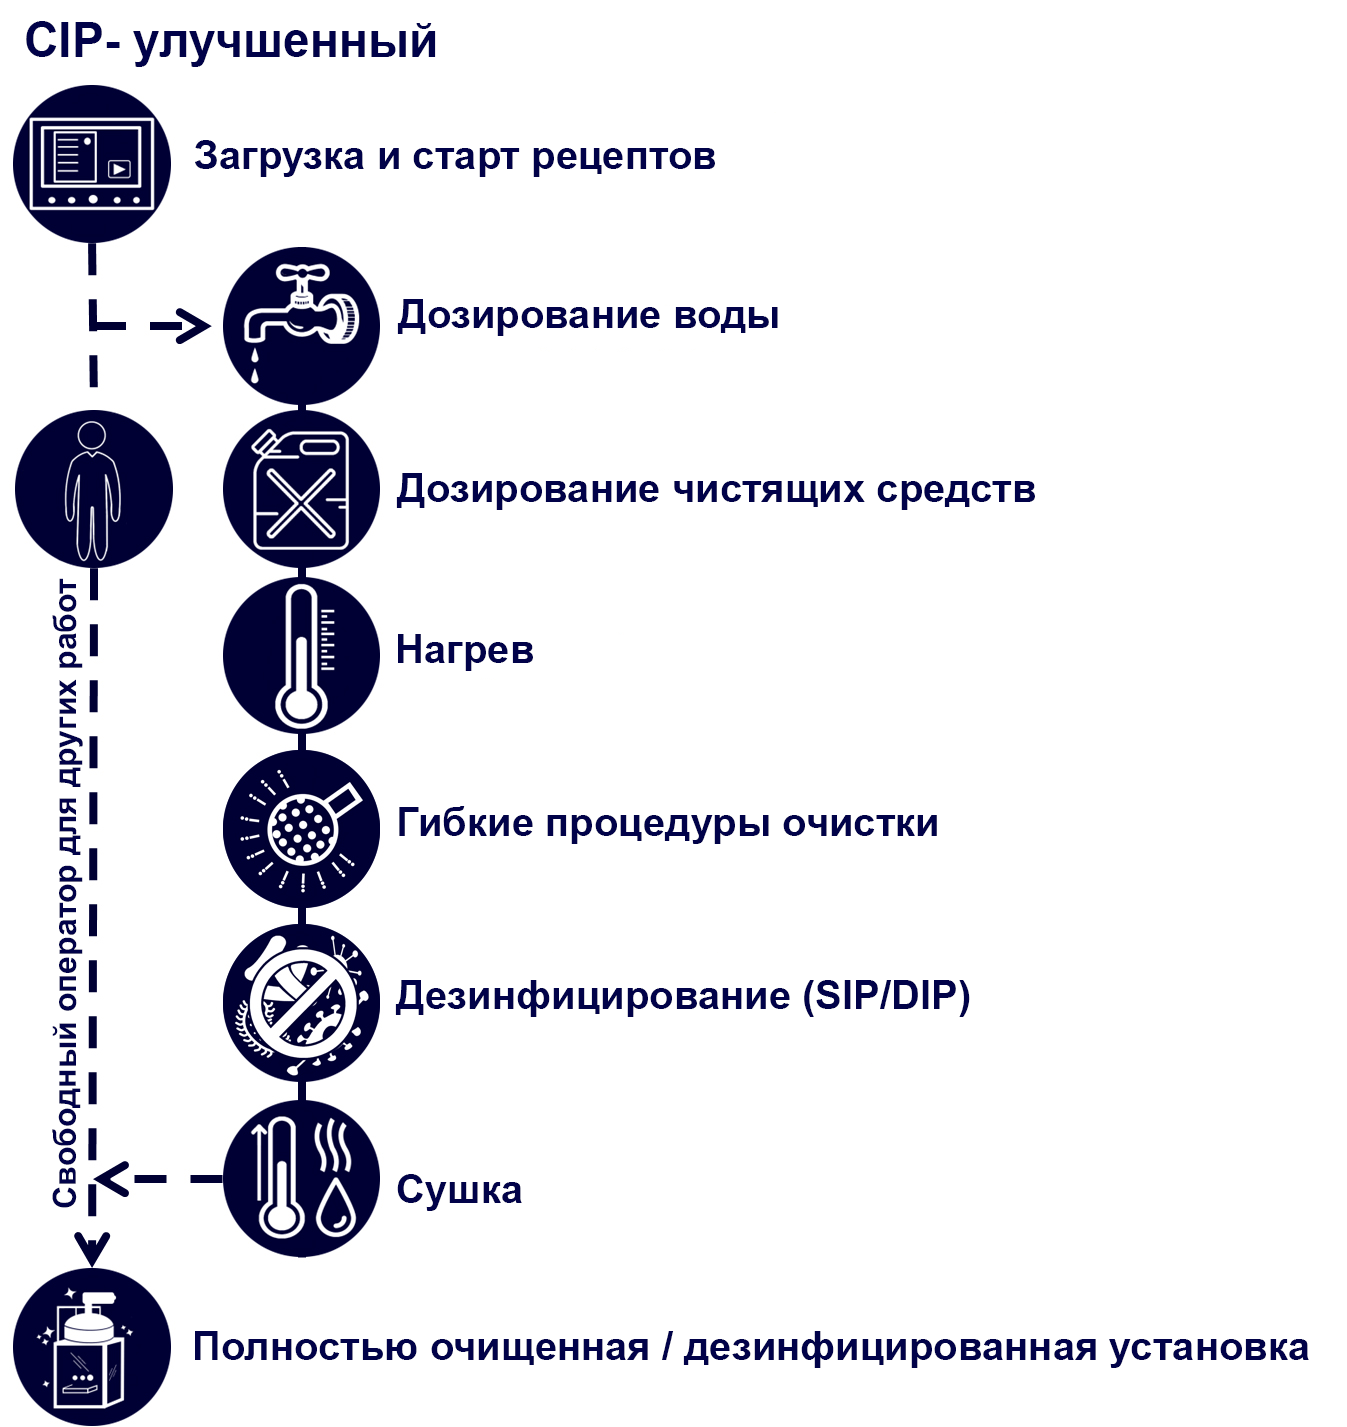 CIP Advanced ru - Technik und Innovation